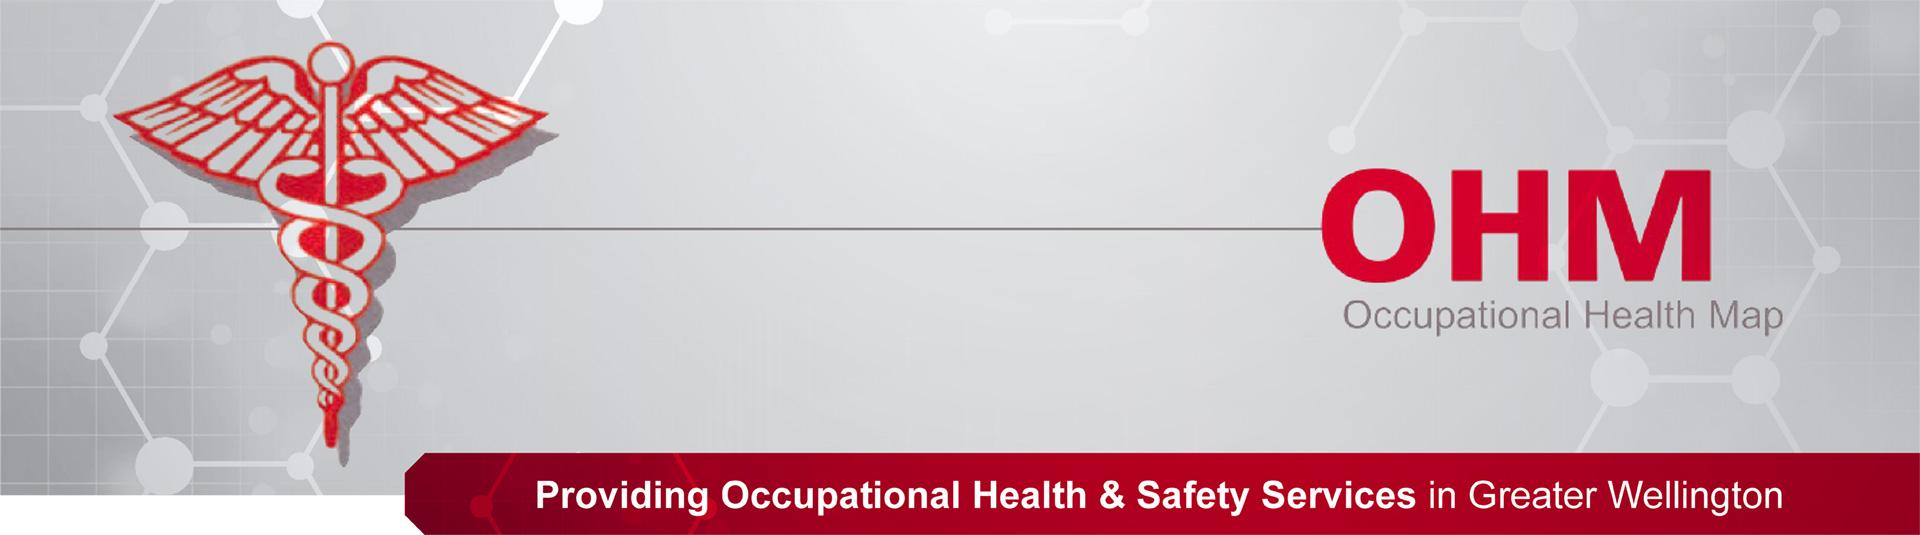 Occupational Health Map